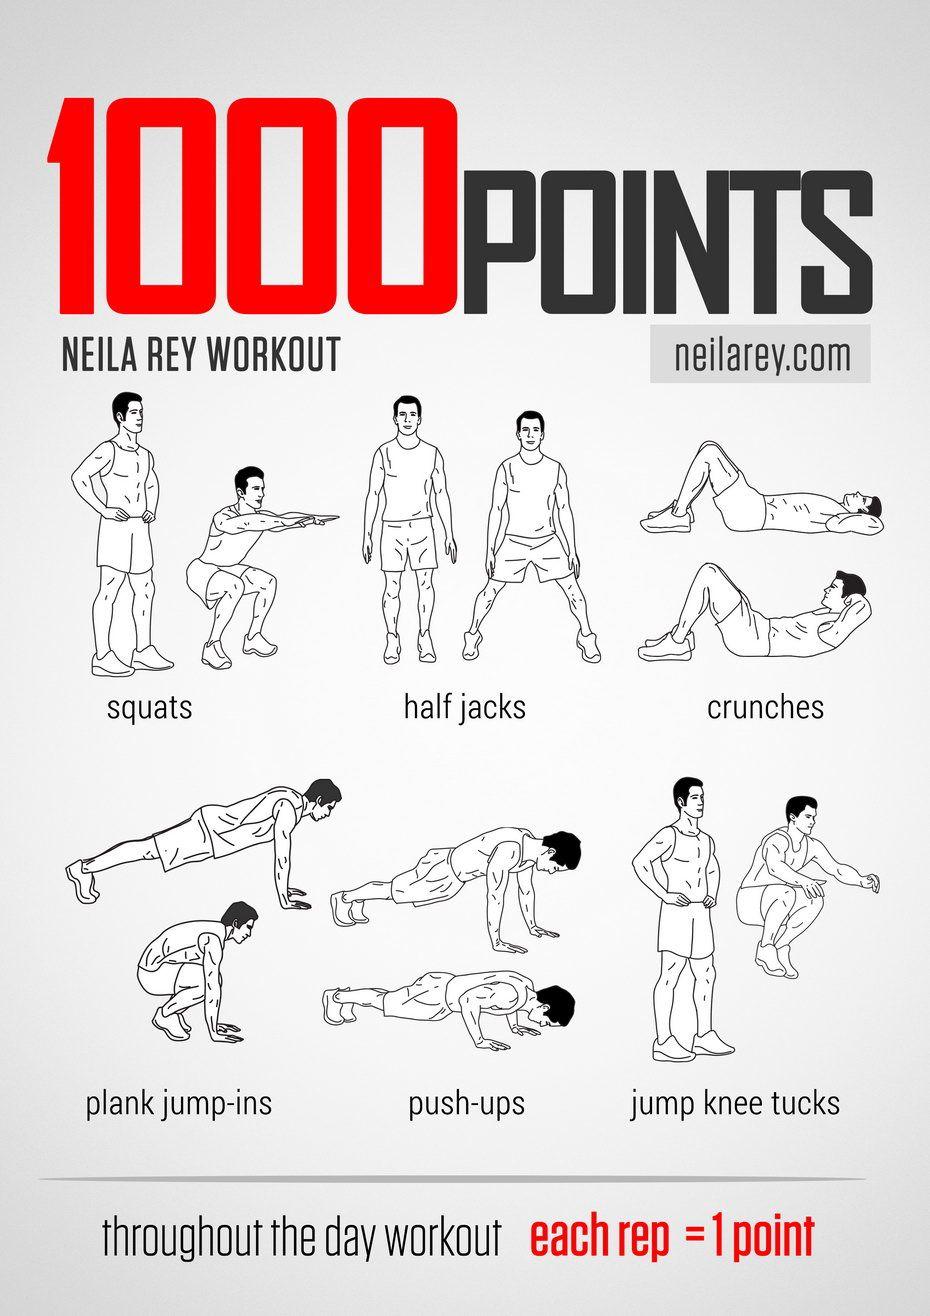 neila rey workout pdf download